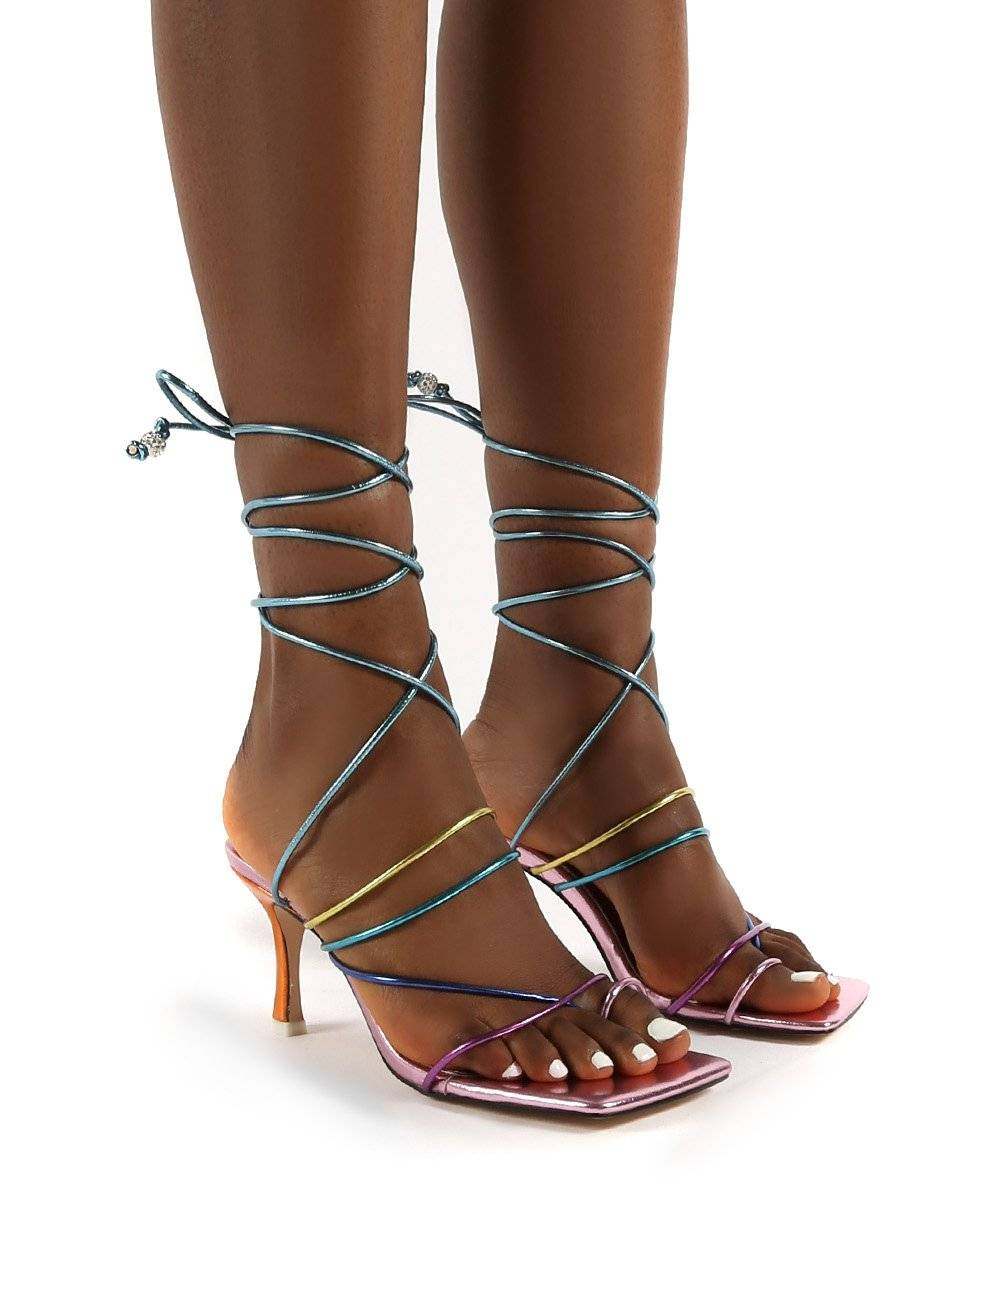 Public Desire US Cabo Multi Strappy Lace Up Square Toe Kitten Heels - US 6